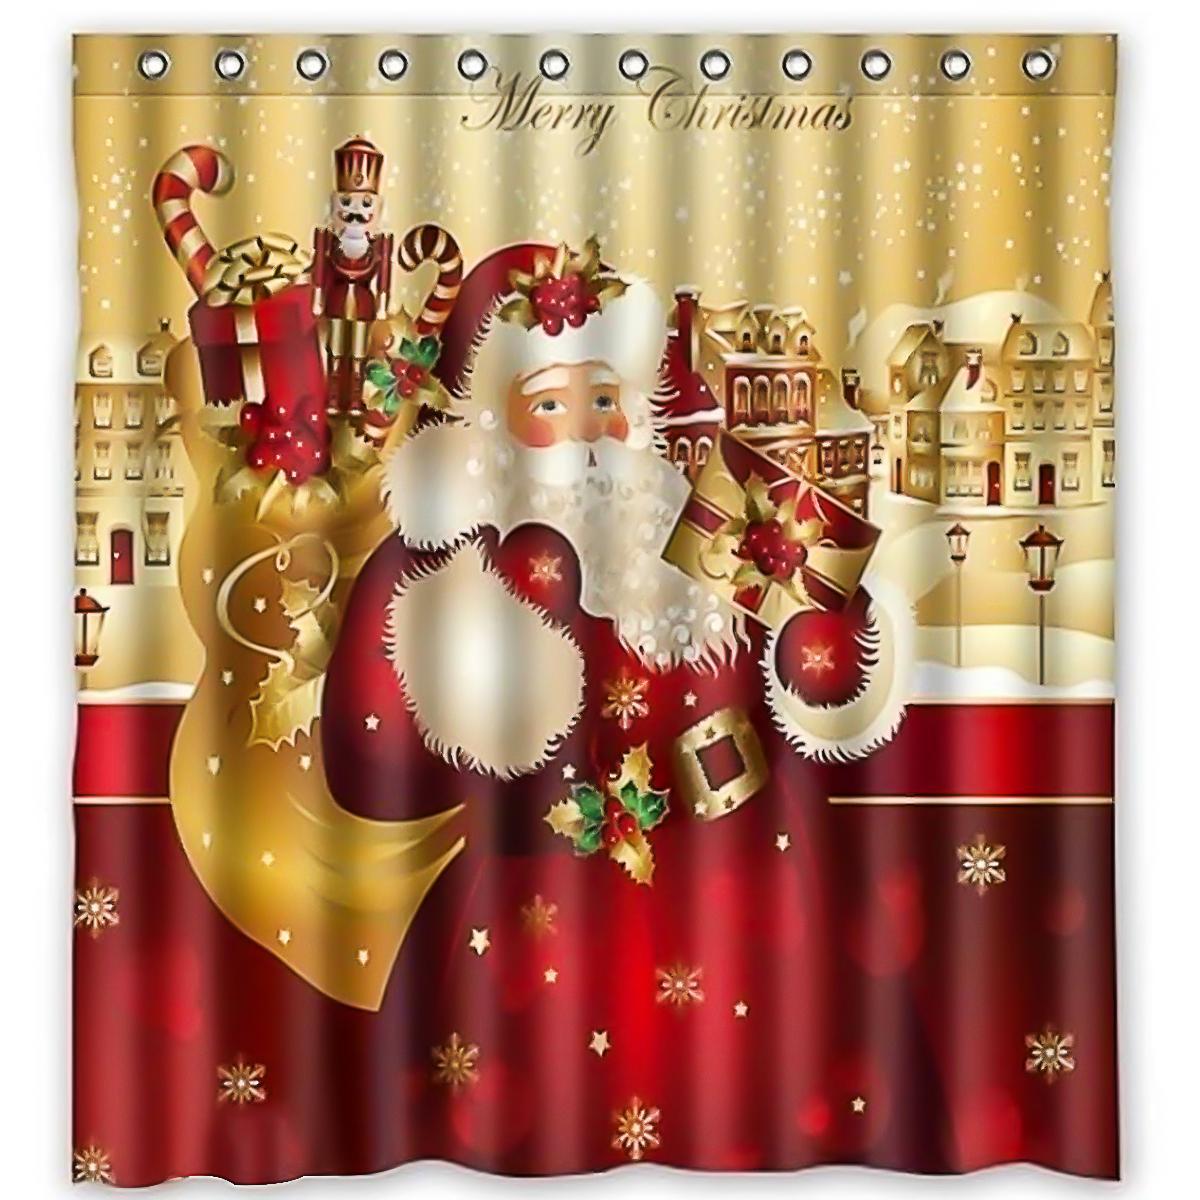 Red Santa Claus Christmas Decor Waterproof Bath Home Shower Curtain Hooks 71